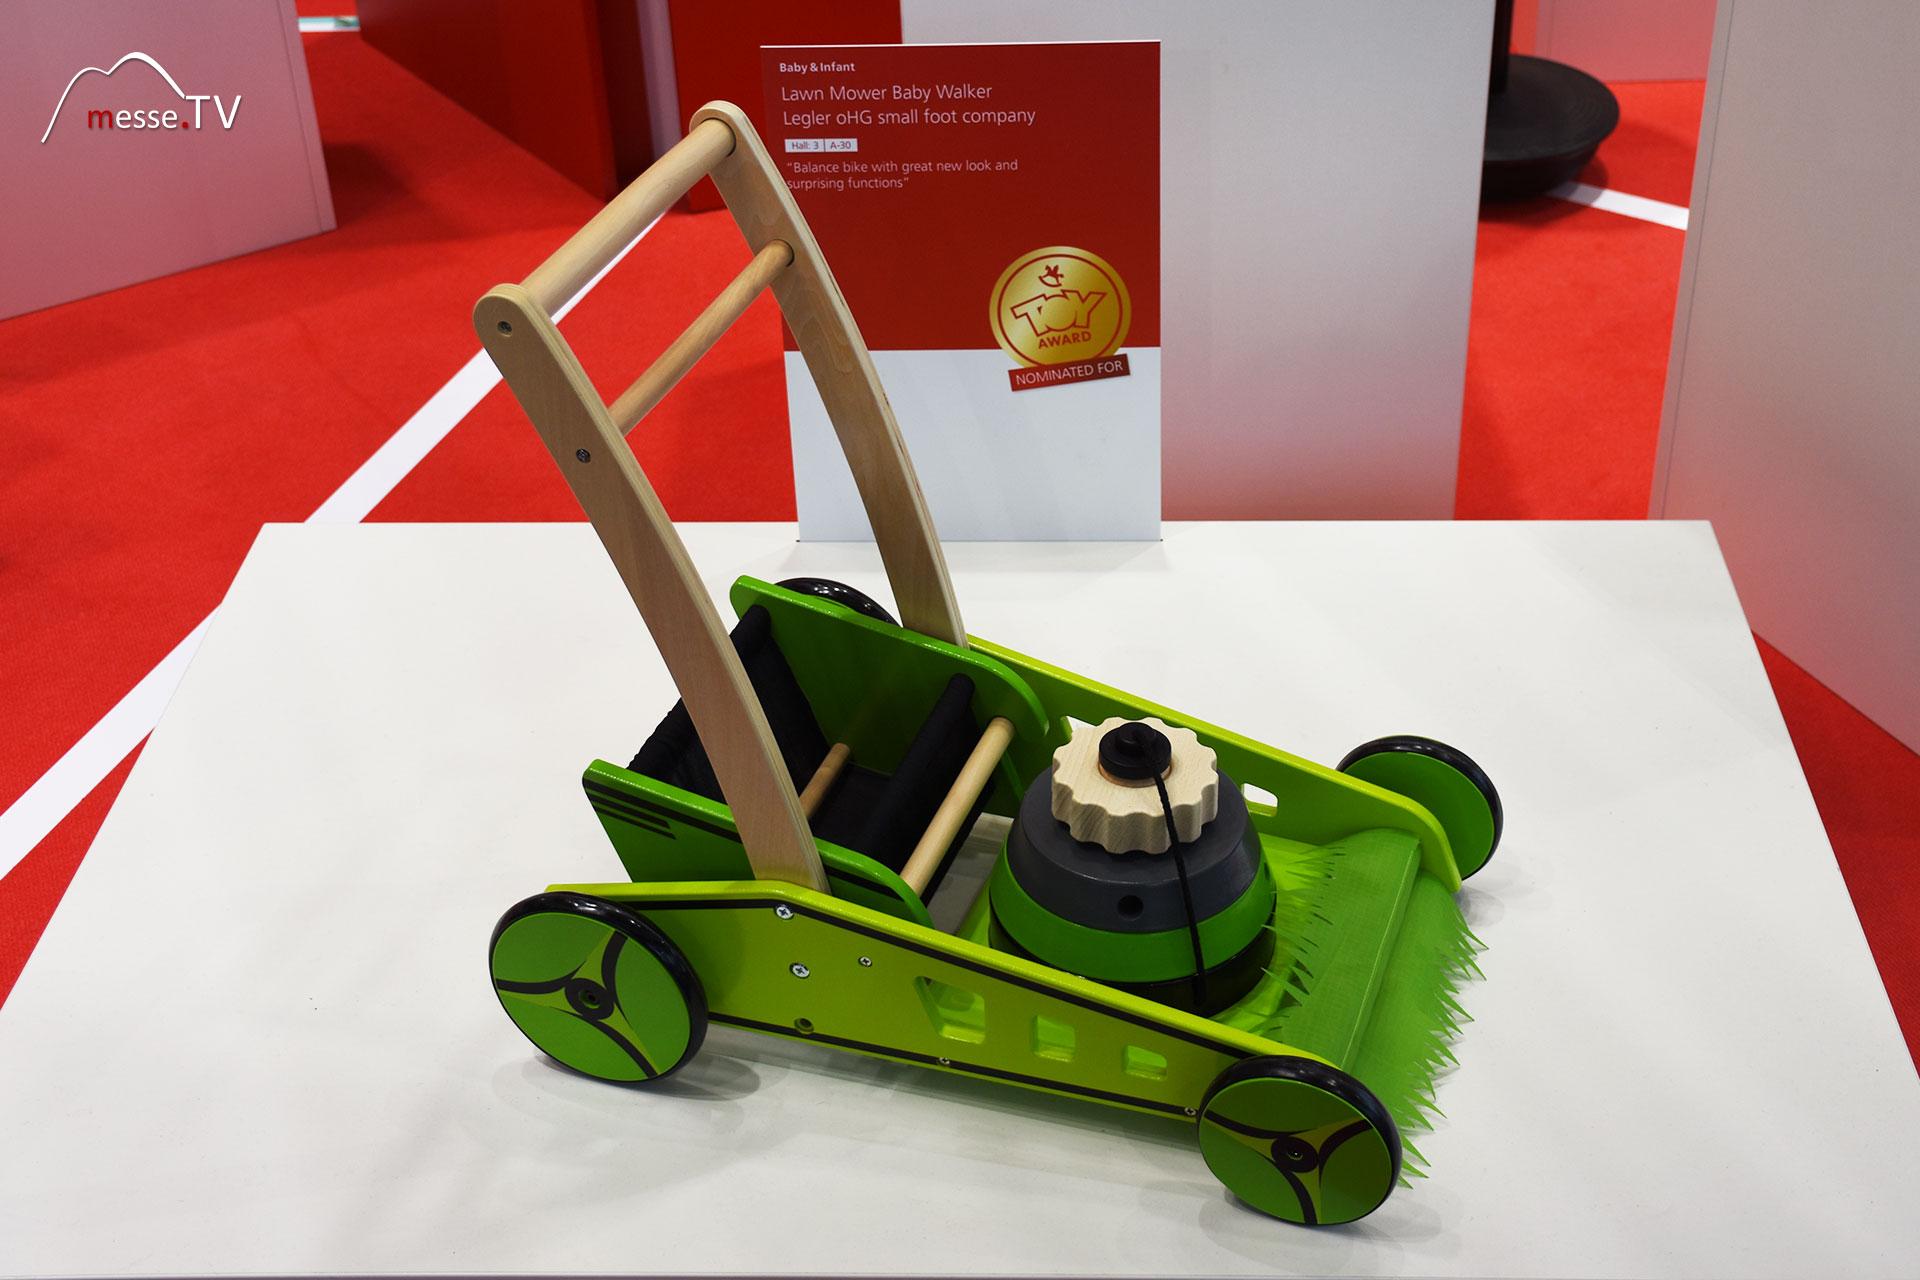 Legler small foot company - Lawn Mower Baby Walker